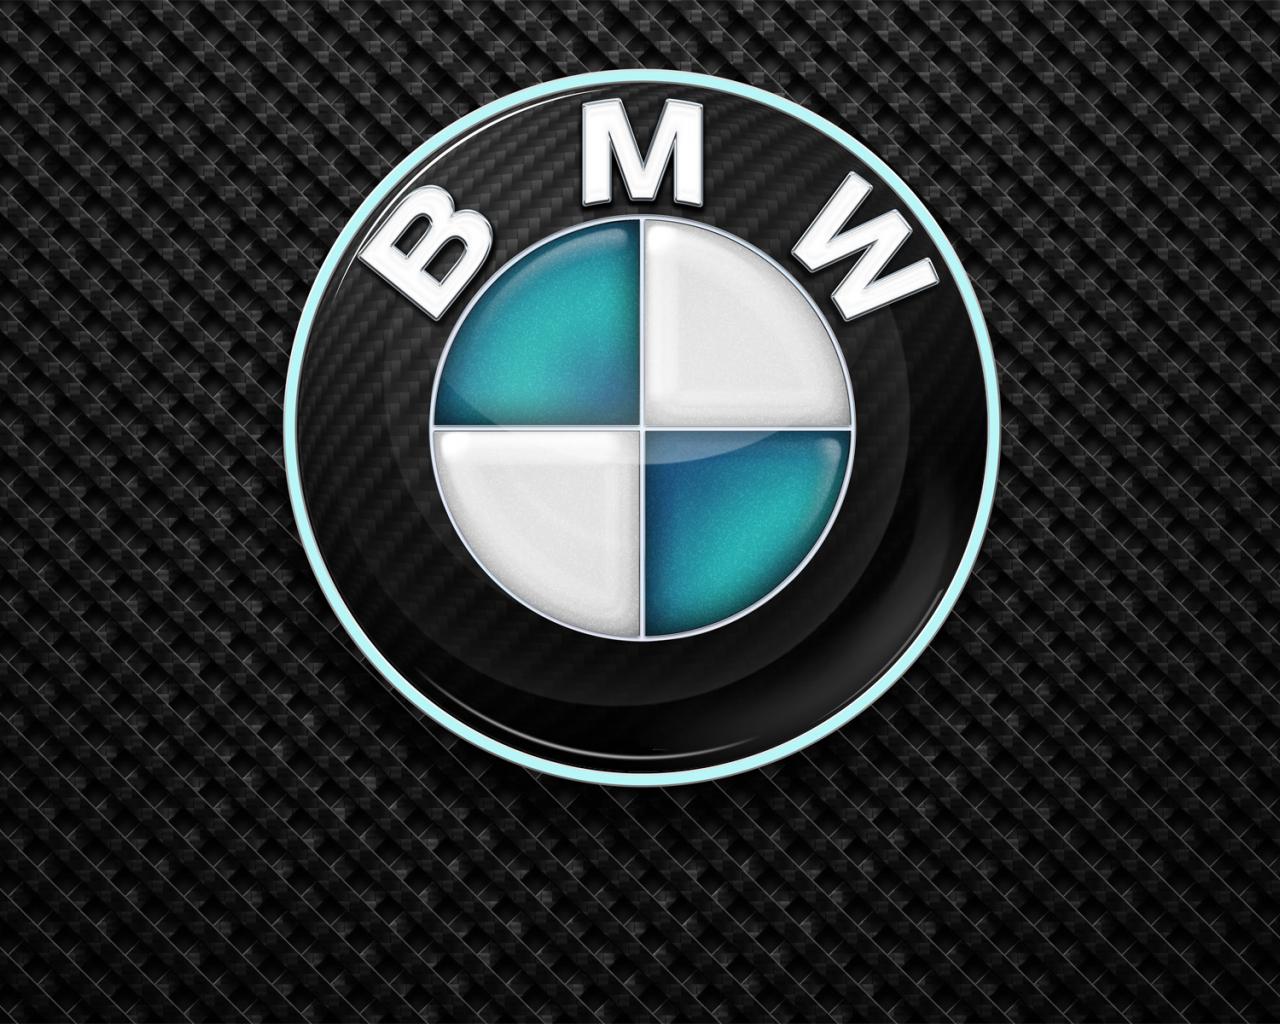 Free Download Bmw M Wallpaper Iphone 6 Image 432 1920x1200